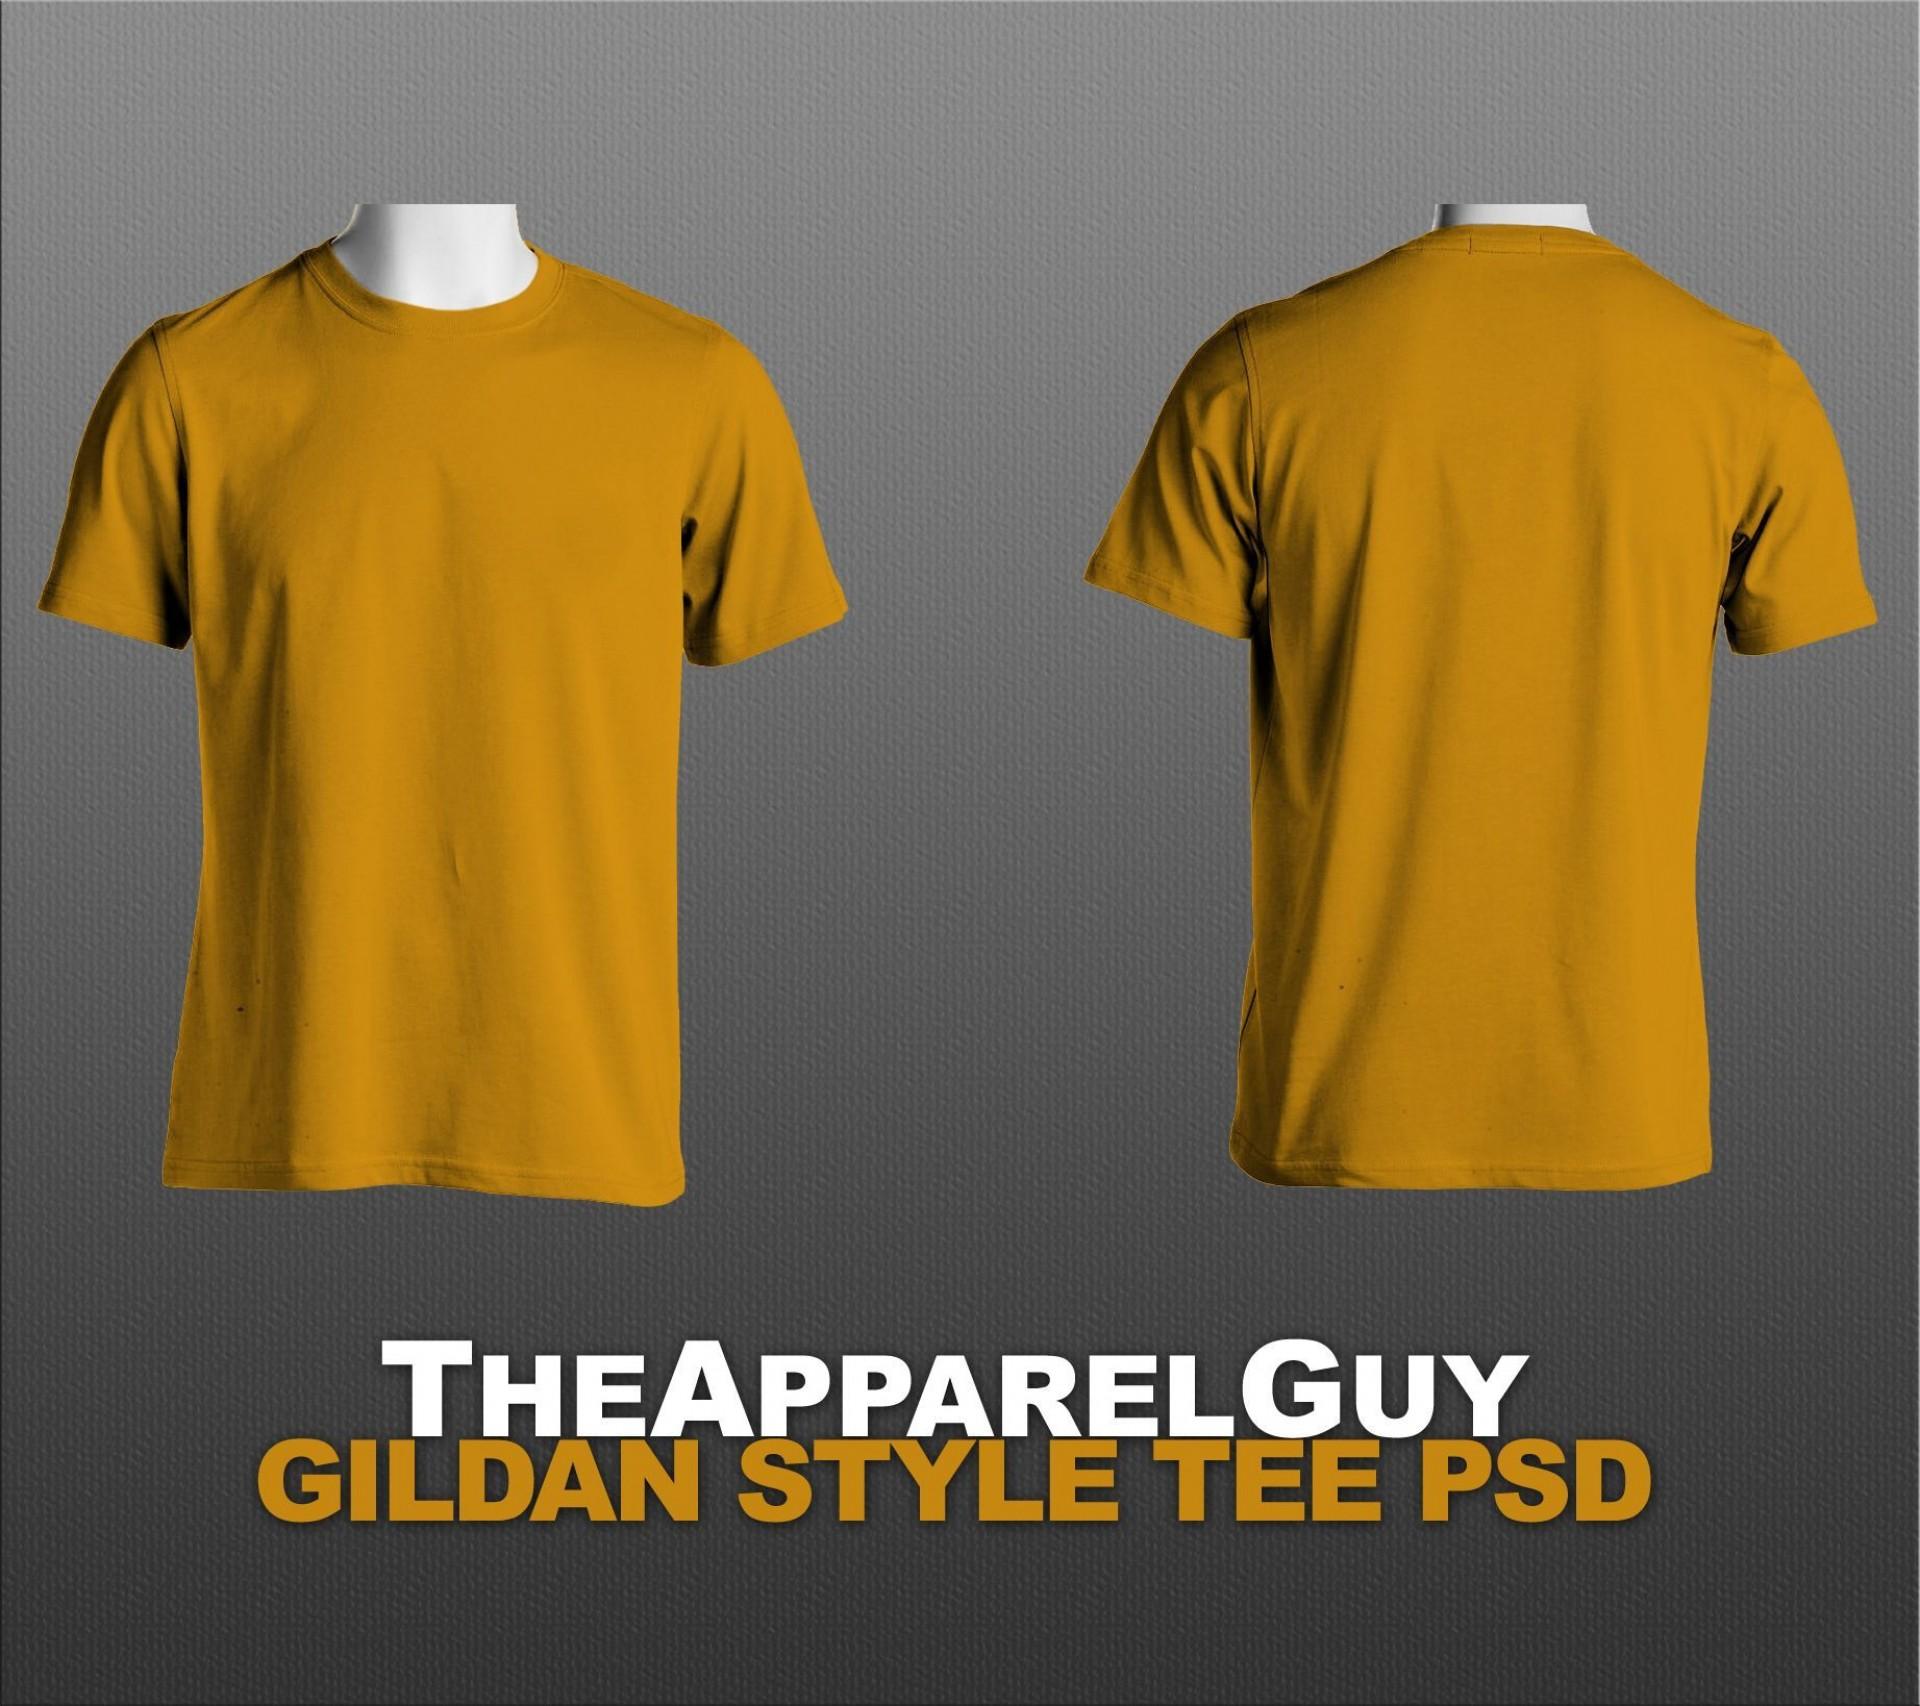 002 Stirring T Shirt Template Psd Highest Clarity  Design Mockup Free White Collar1920